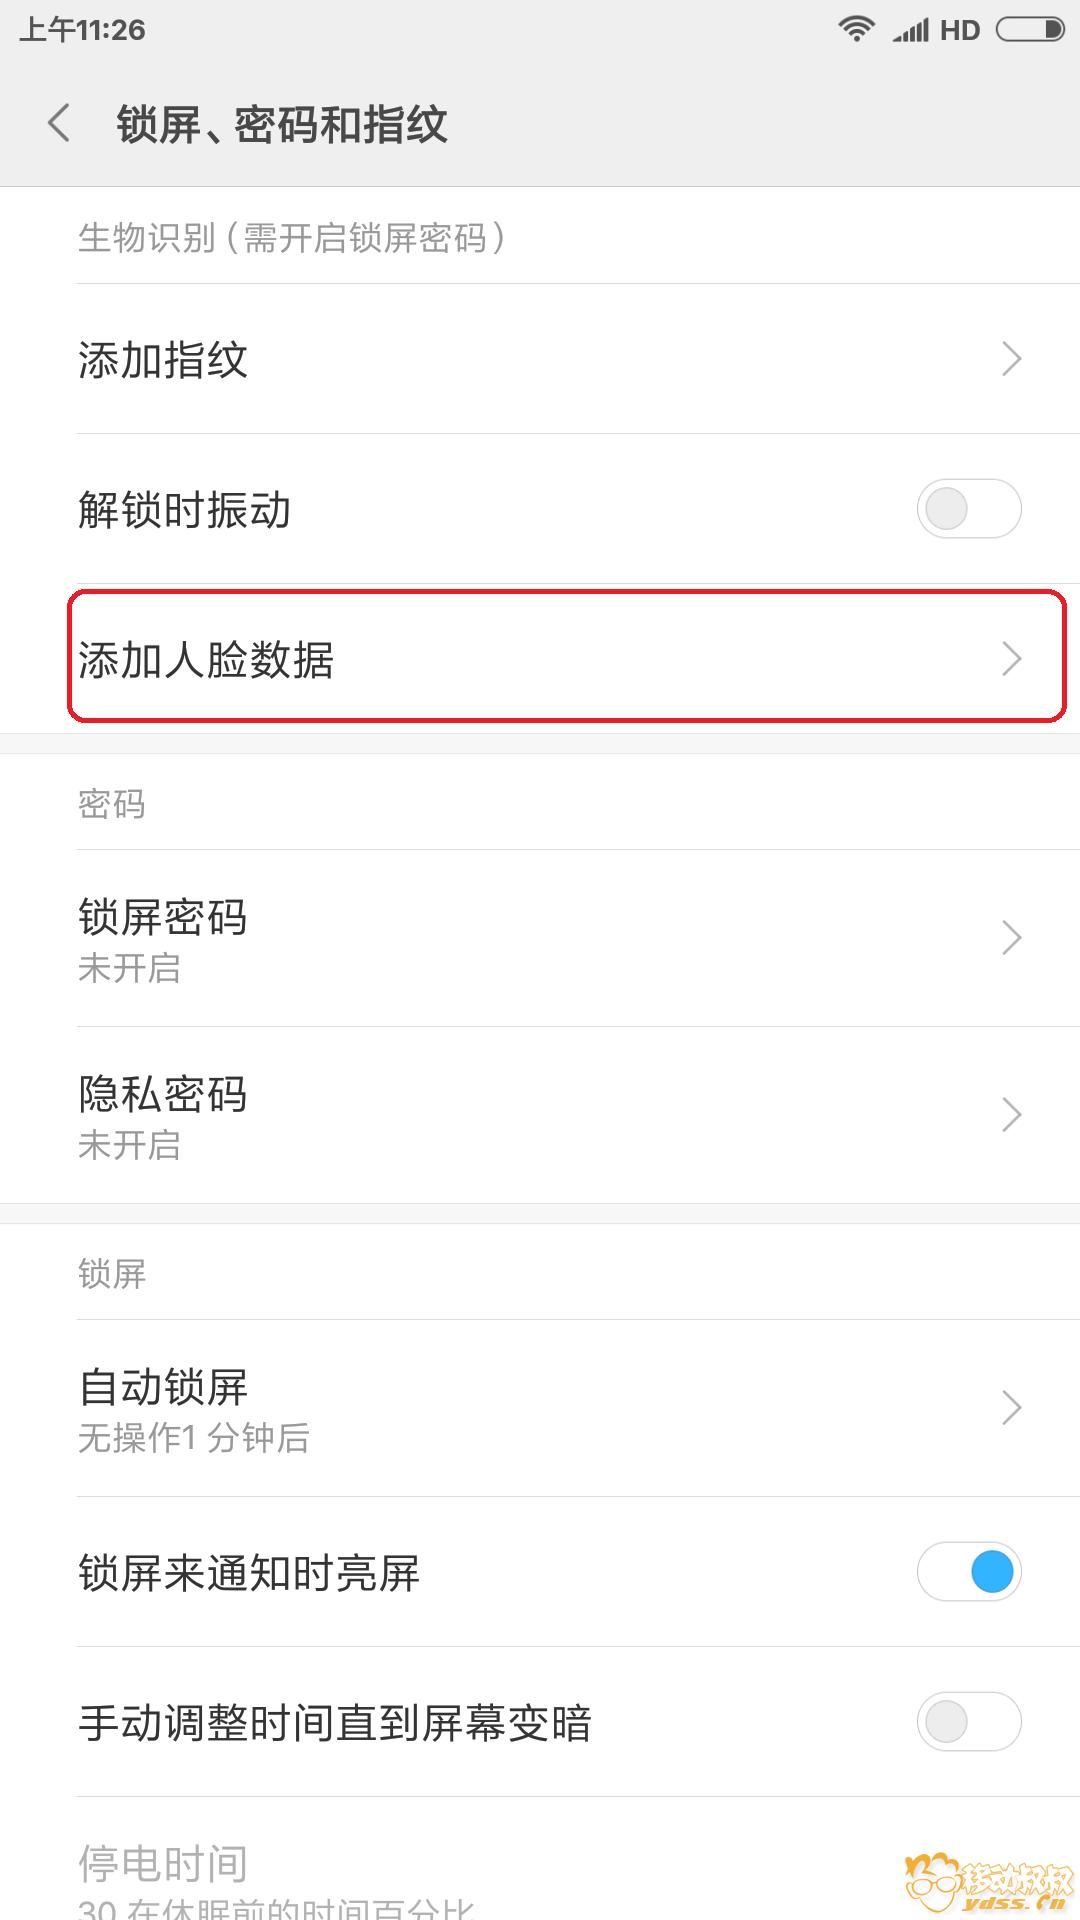 Screenshot_2018-05-04-11-26-05-931_com.android.settings.png